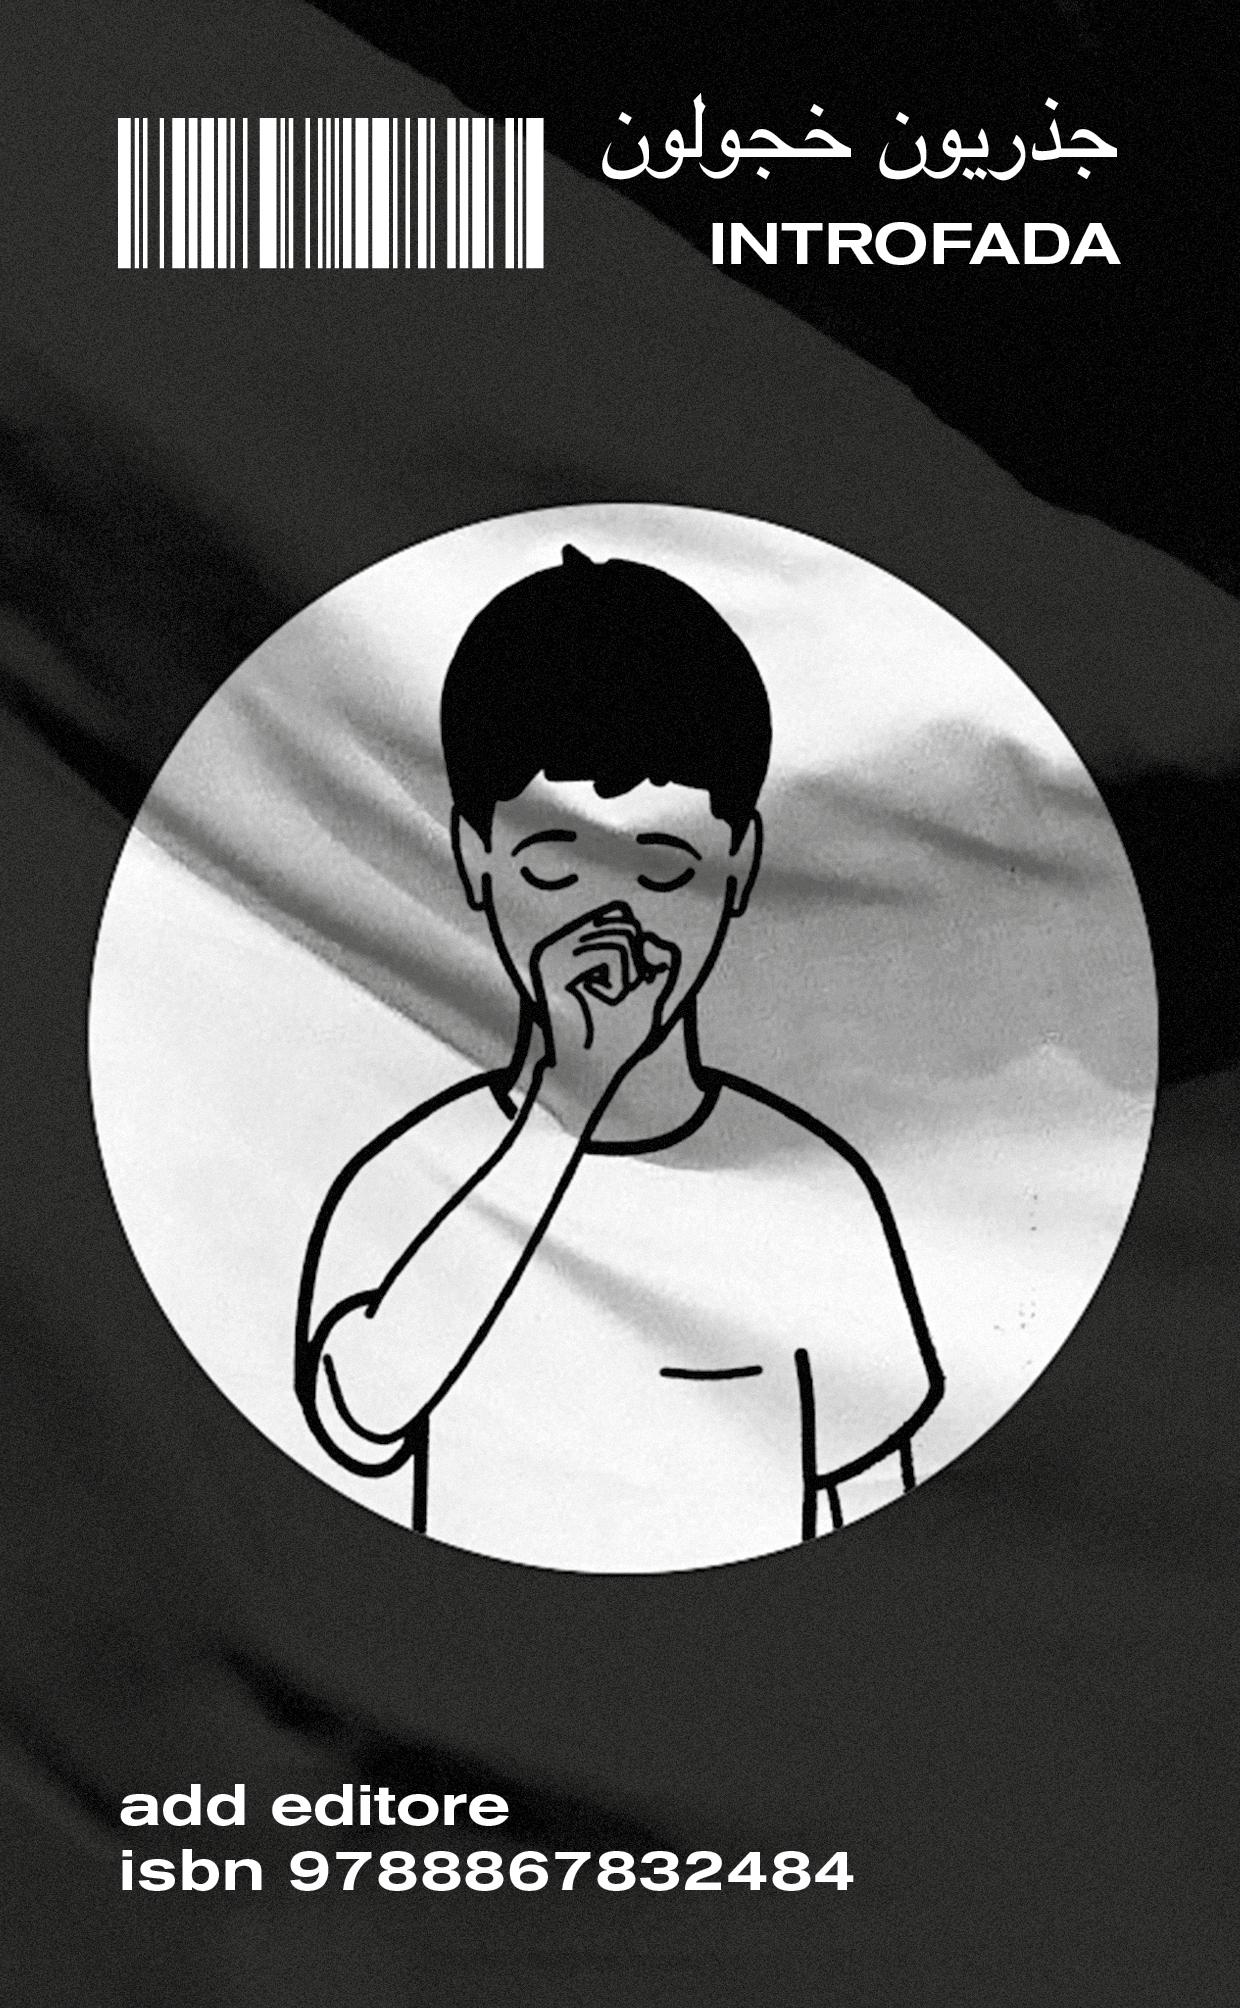 Hamja Ahsan – Introfada. Lotta antisistema del militante introverso